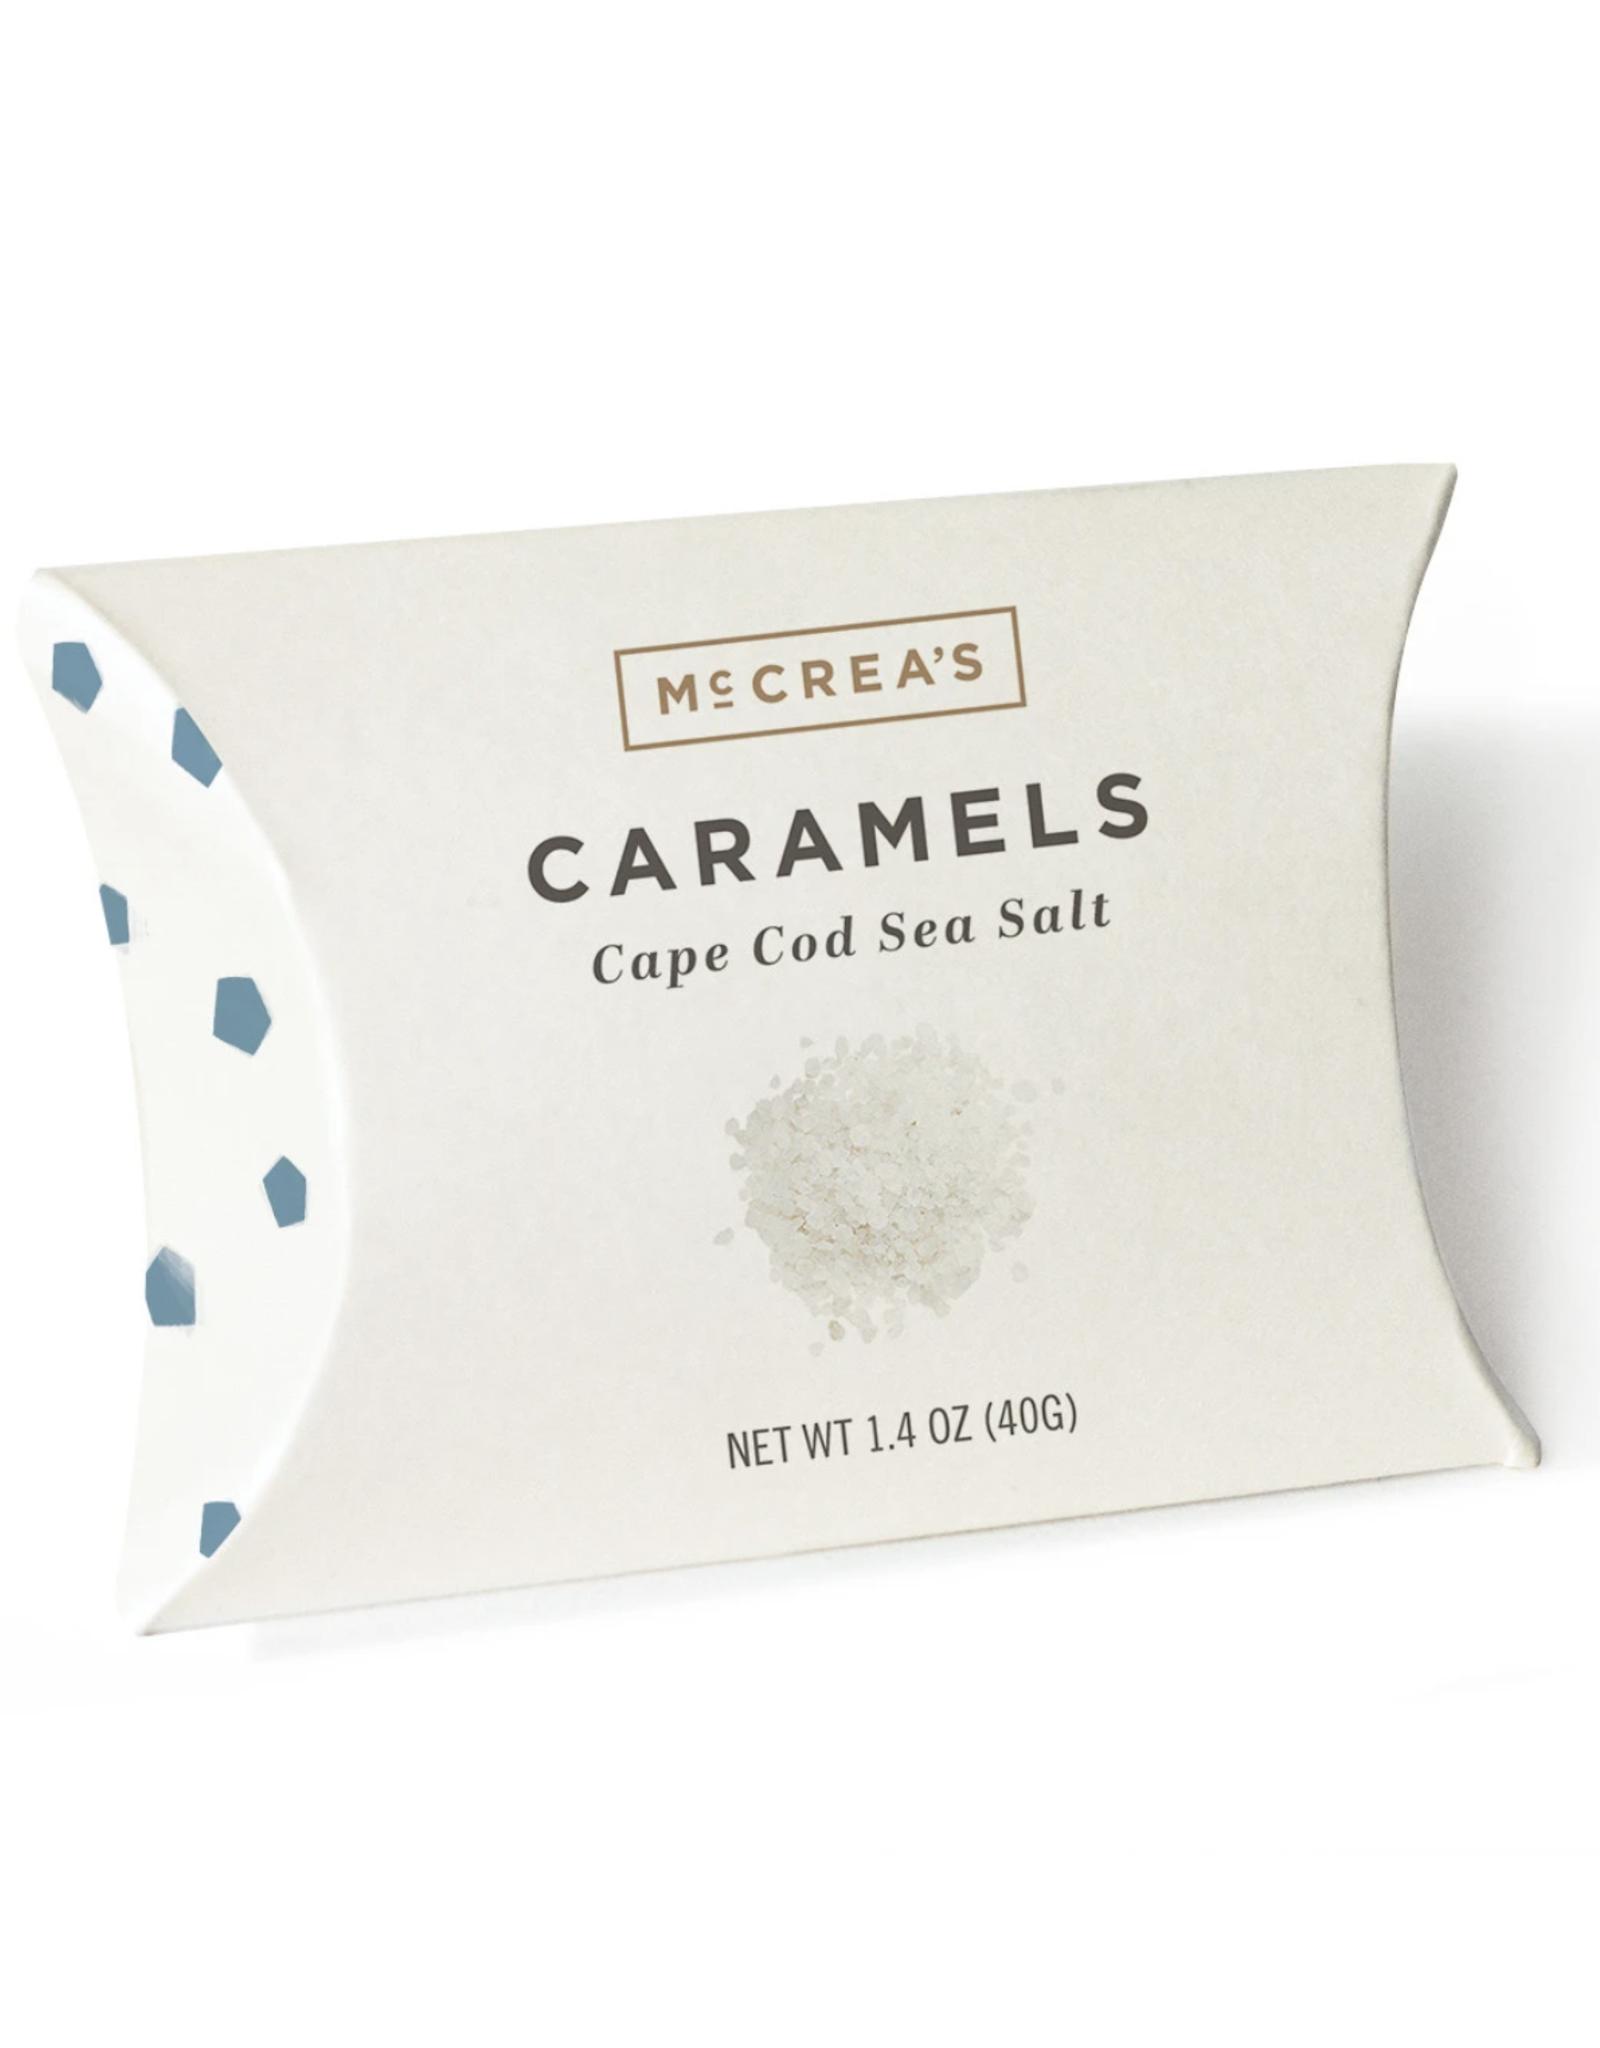 McCrea's Candies 1.4oz Pillows Cape Cod Sea Salt